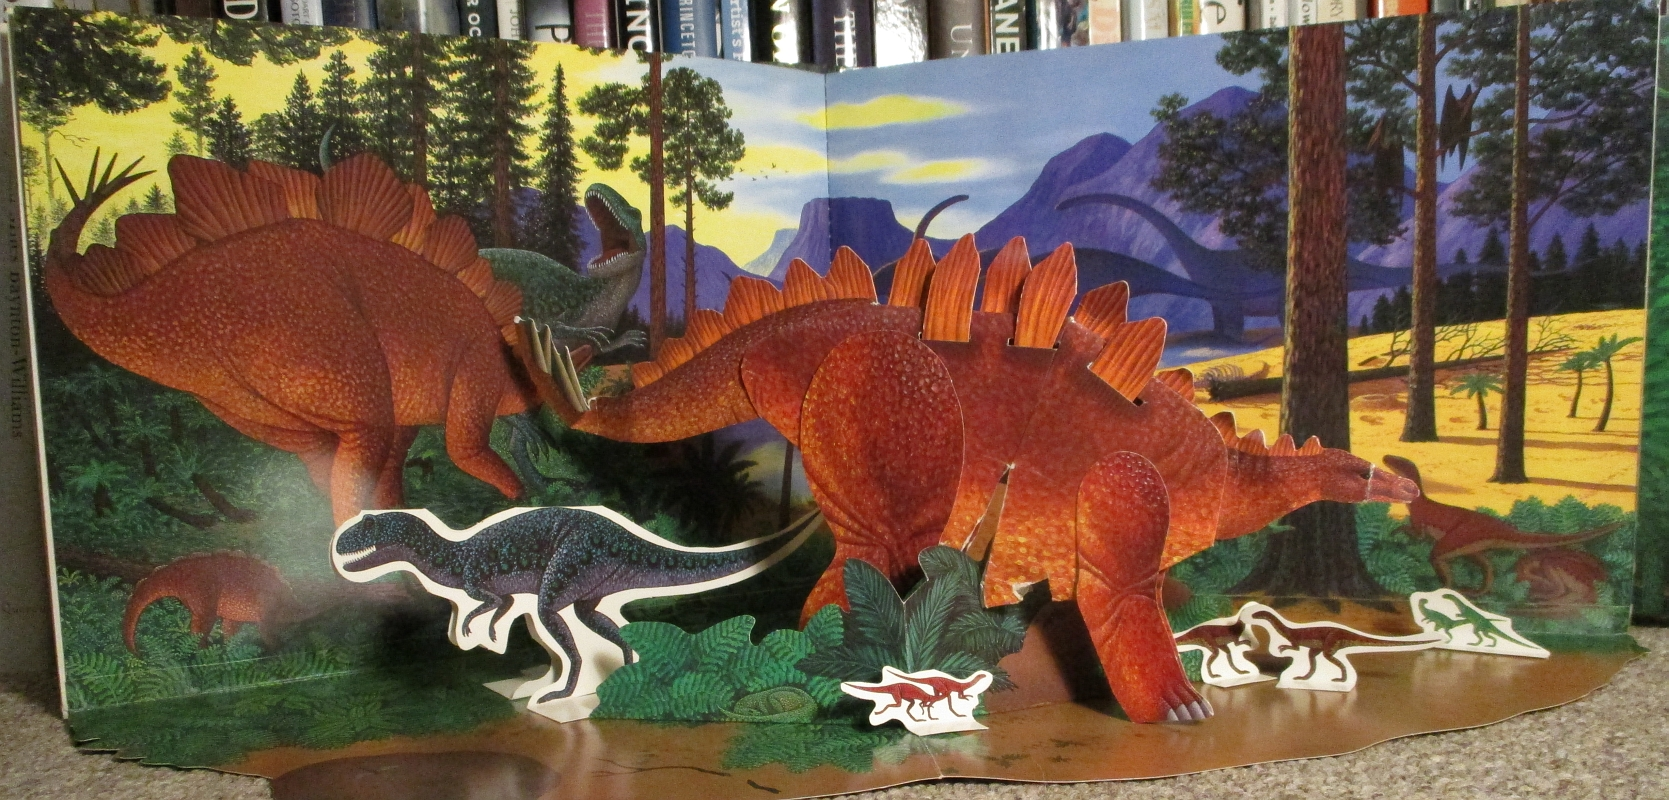 Dinosaur Park Stegosaurus and friends